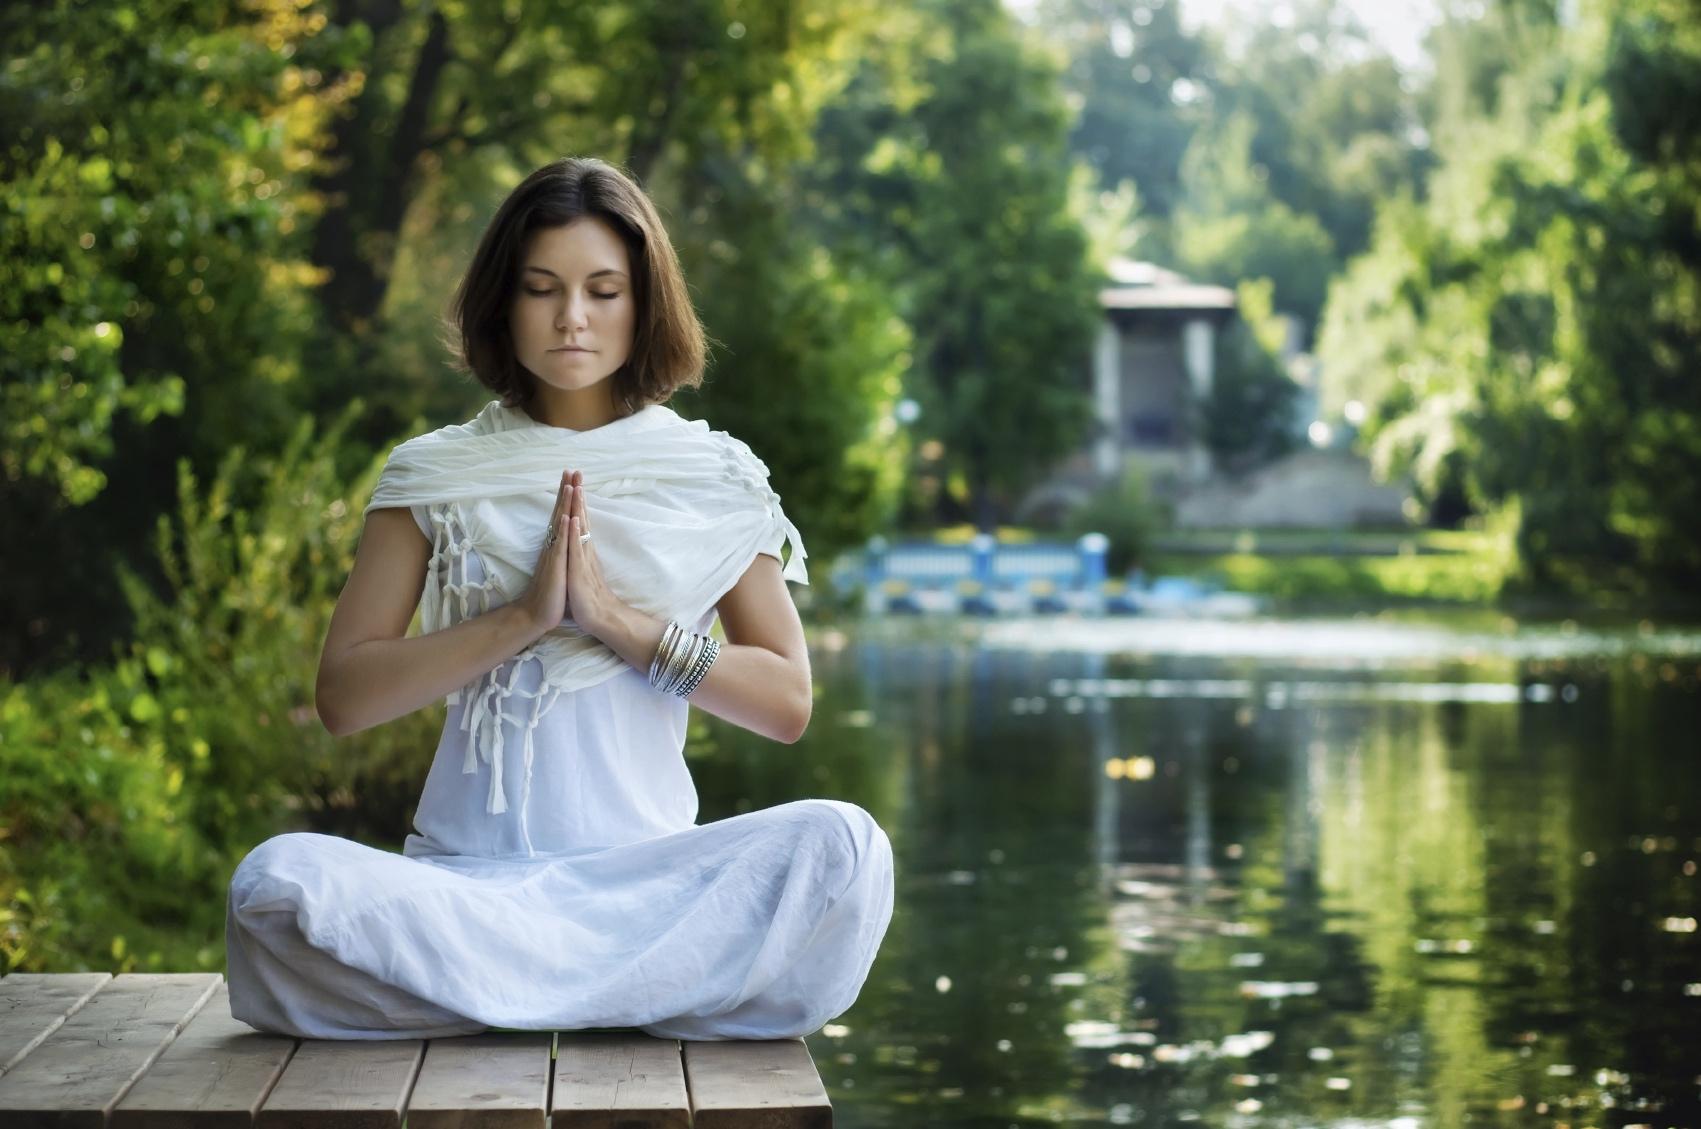 Yoga-in-Nature-Workshops.jpg